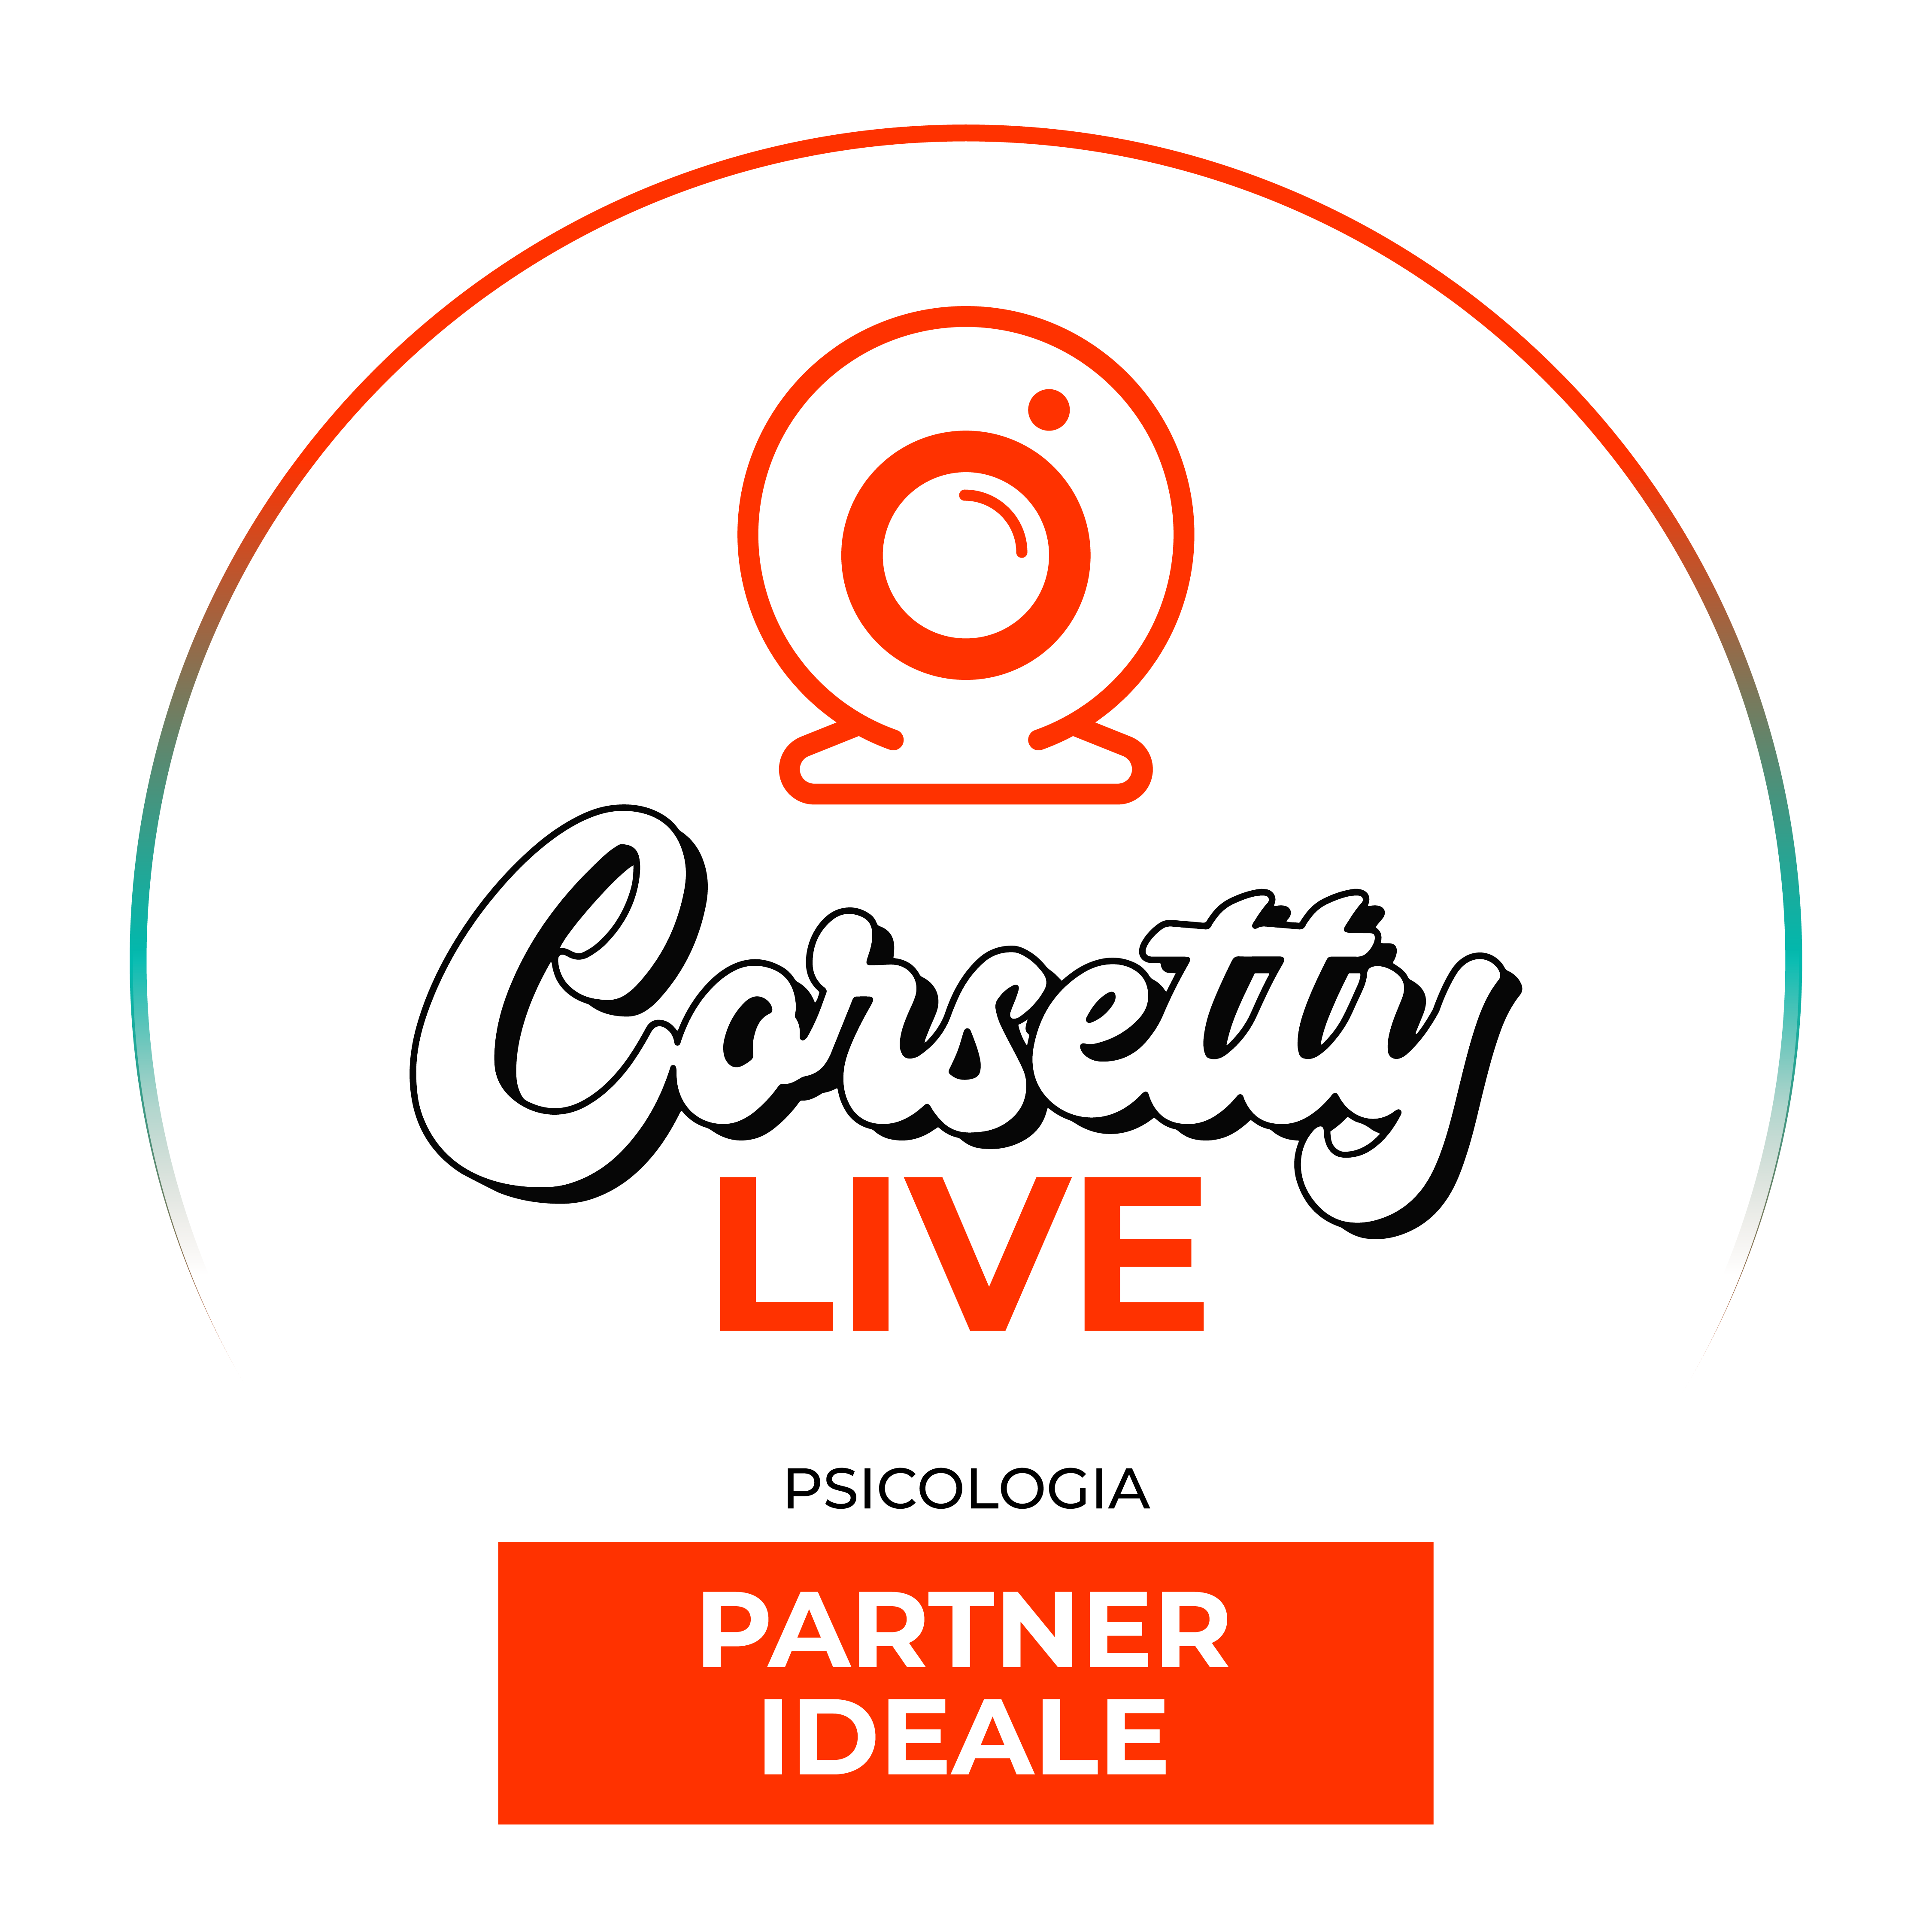 Corsetty – live: PARTNER IDEALE